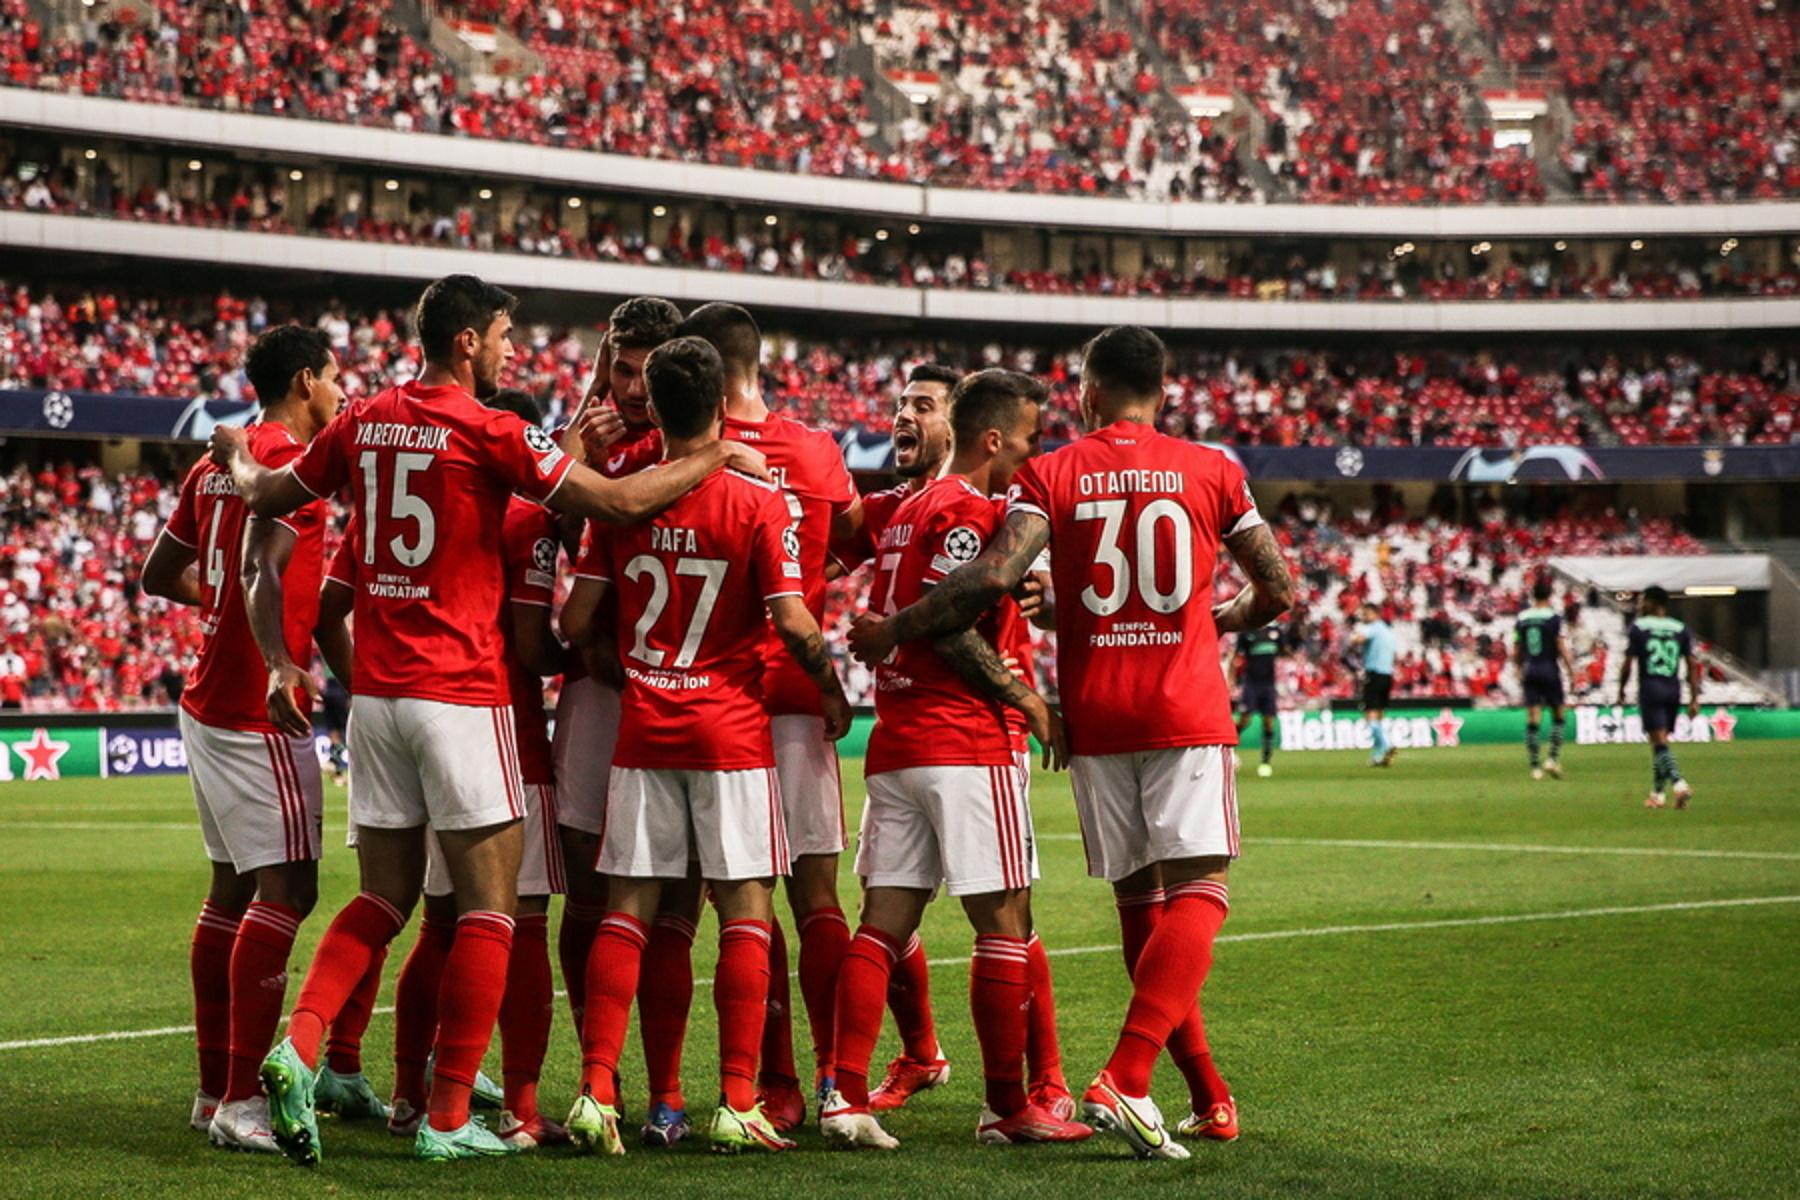 Champions League: Άντεξε η Μπενφίκα με super Βλαχοδήμο και πέρασε στους ομίλους